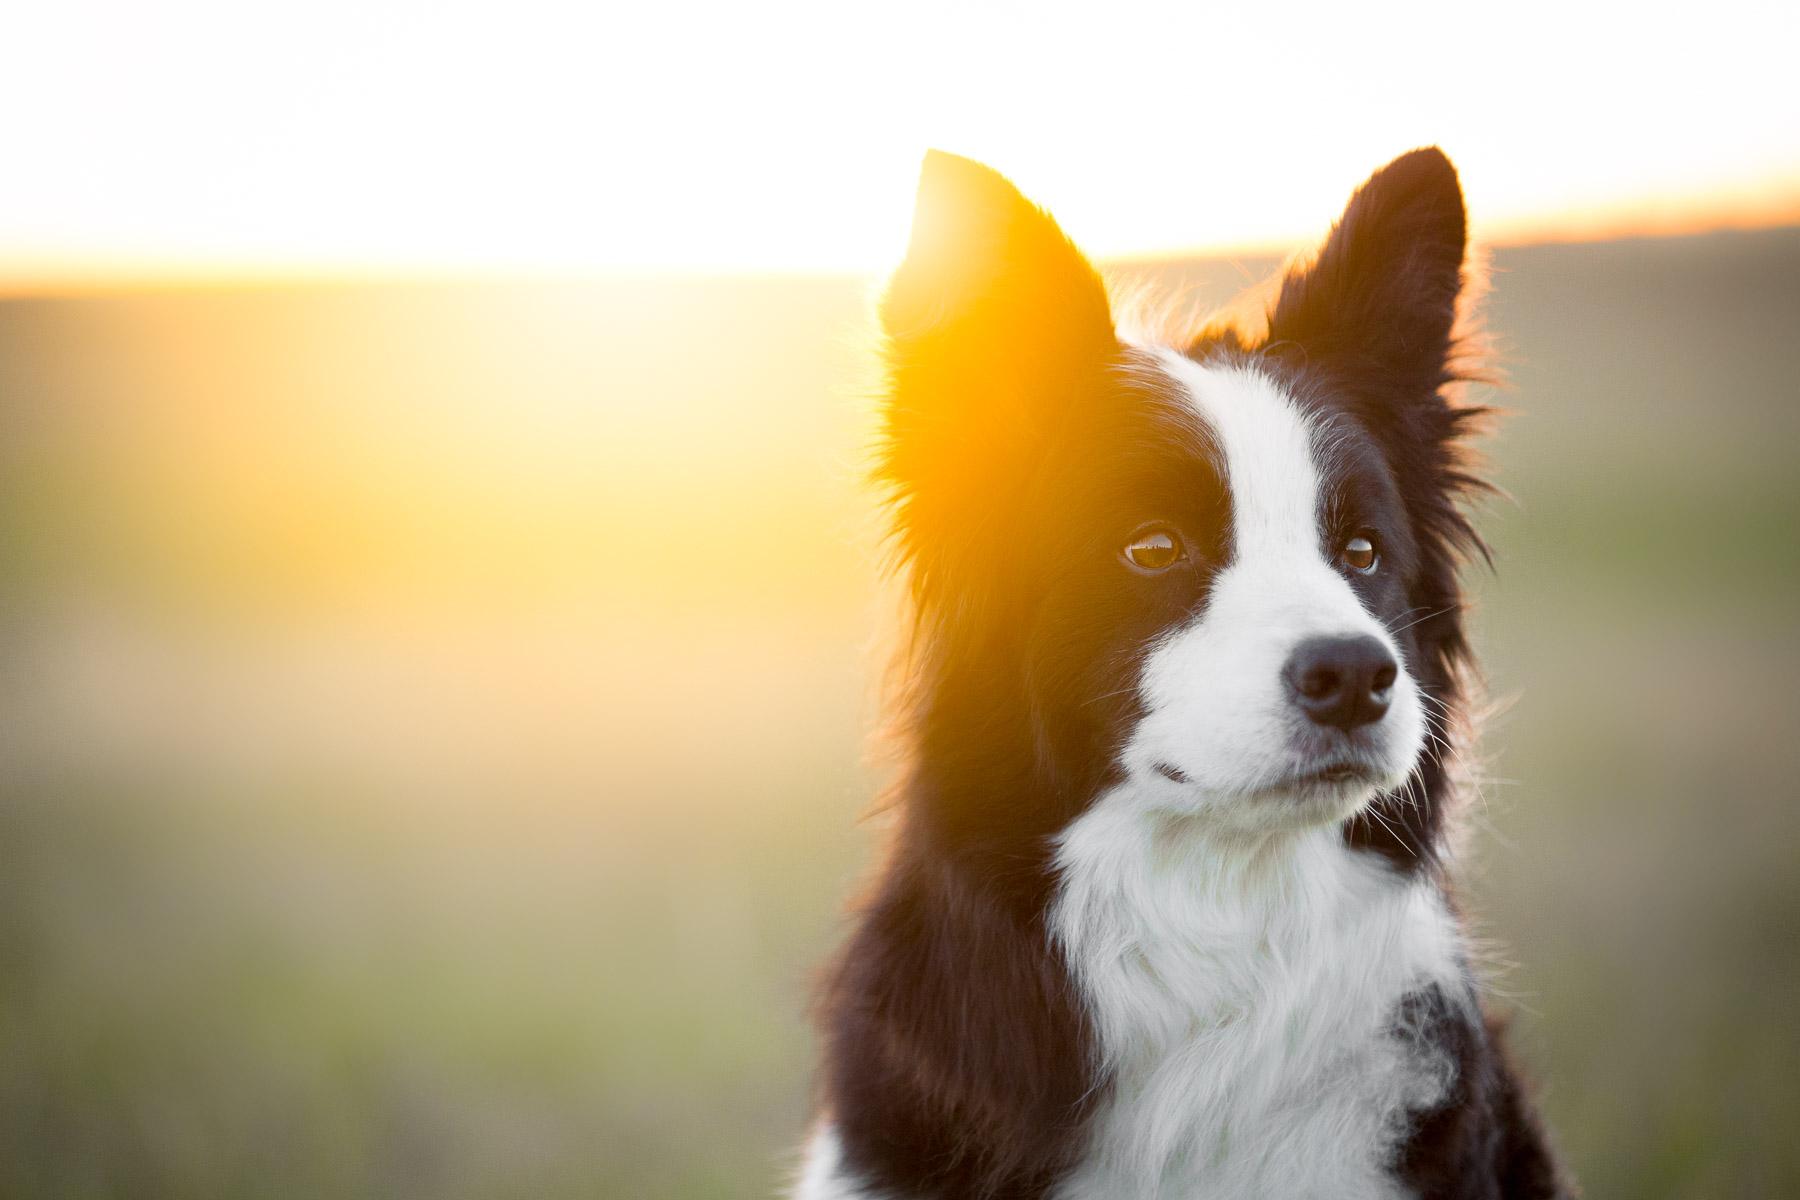 collie-dog-portrait-photographer-sunset.jpg